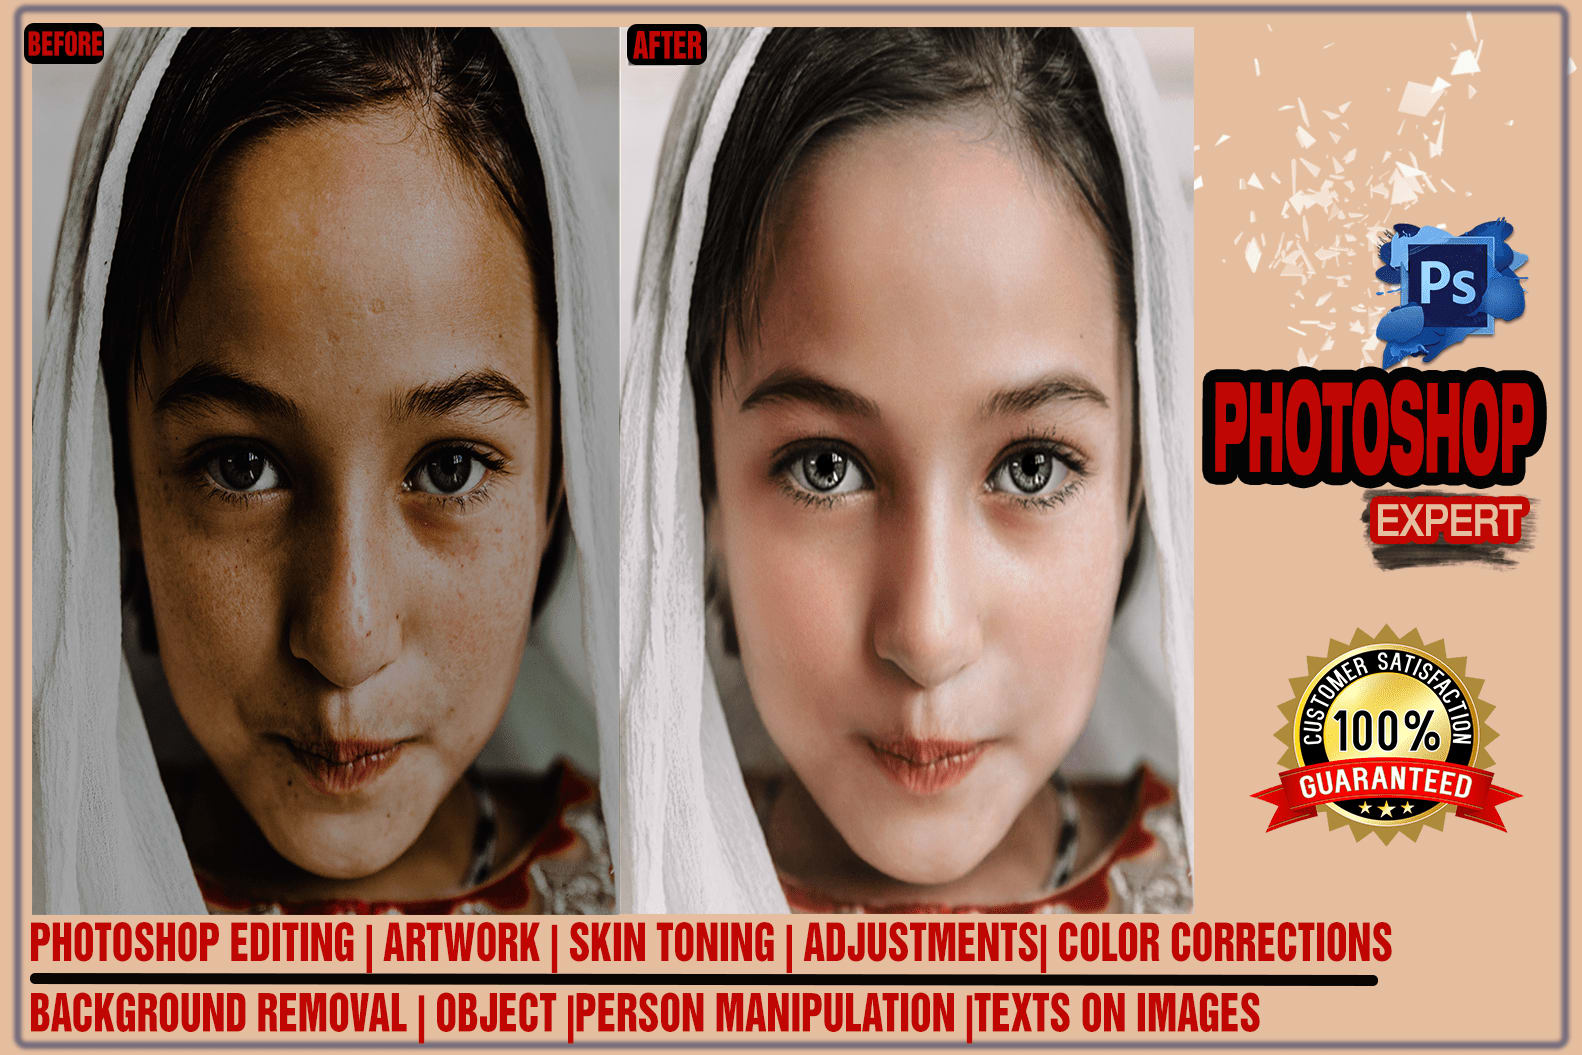 Portfolio for Adobe Photoshop manipulation and editing